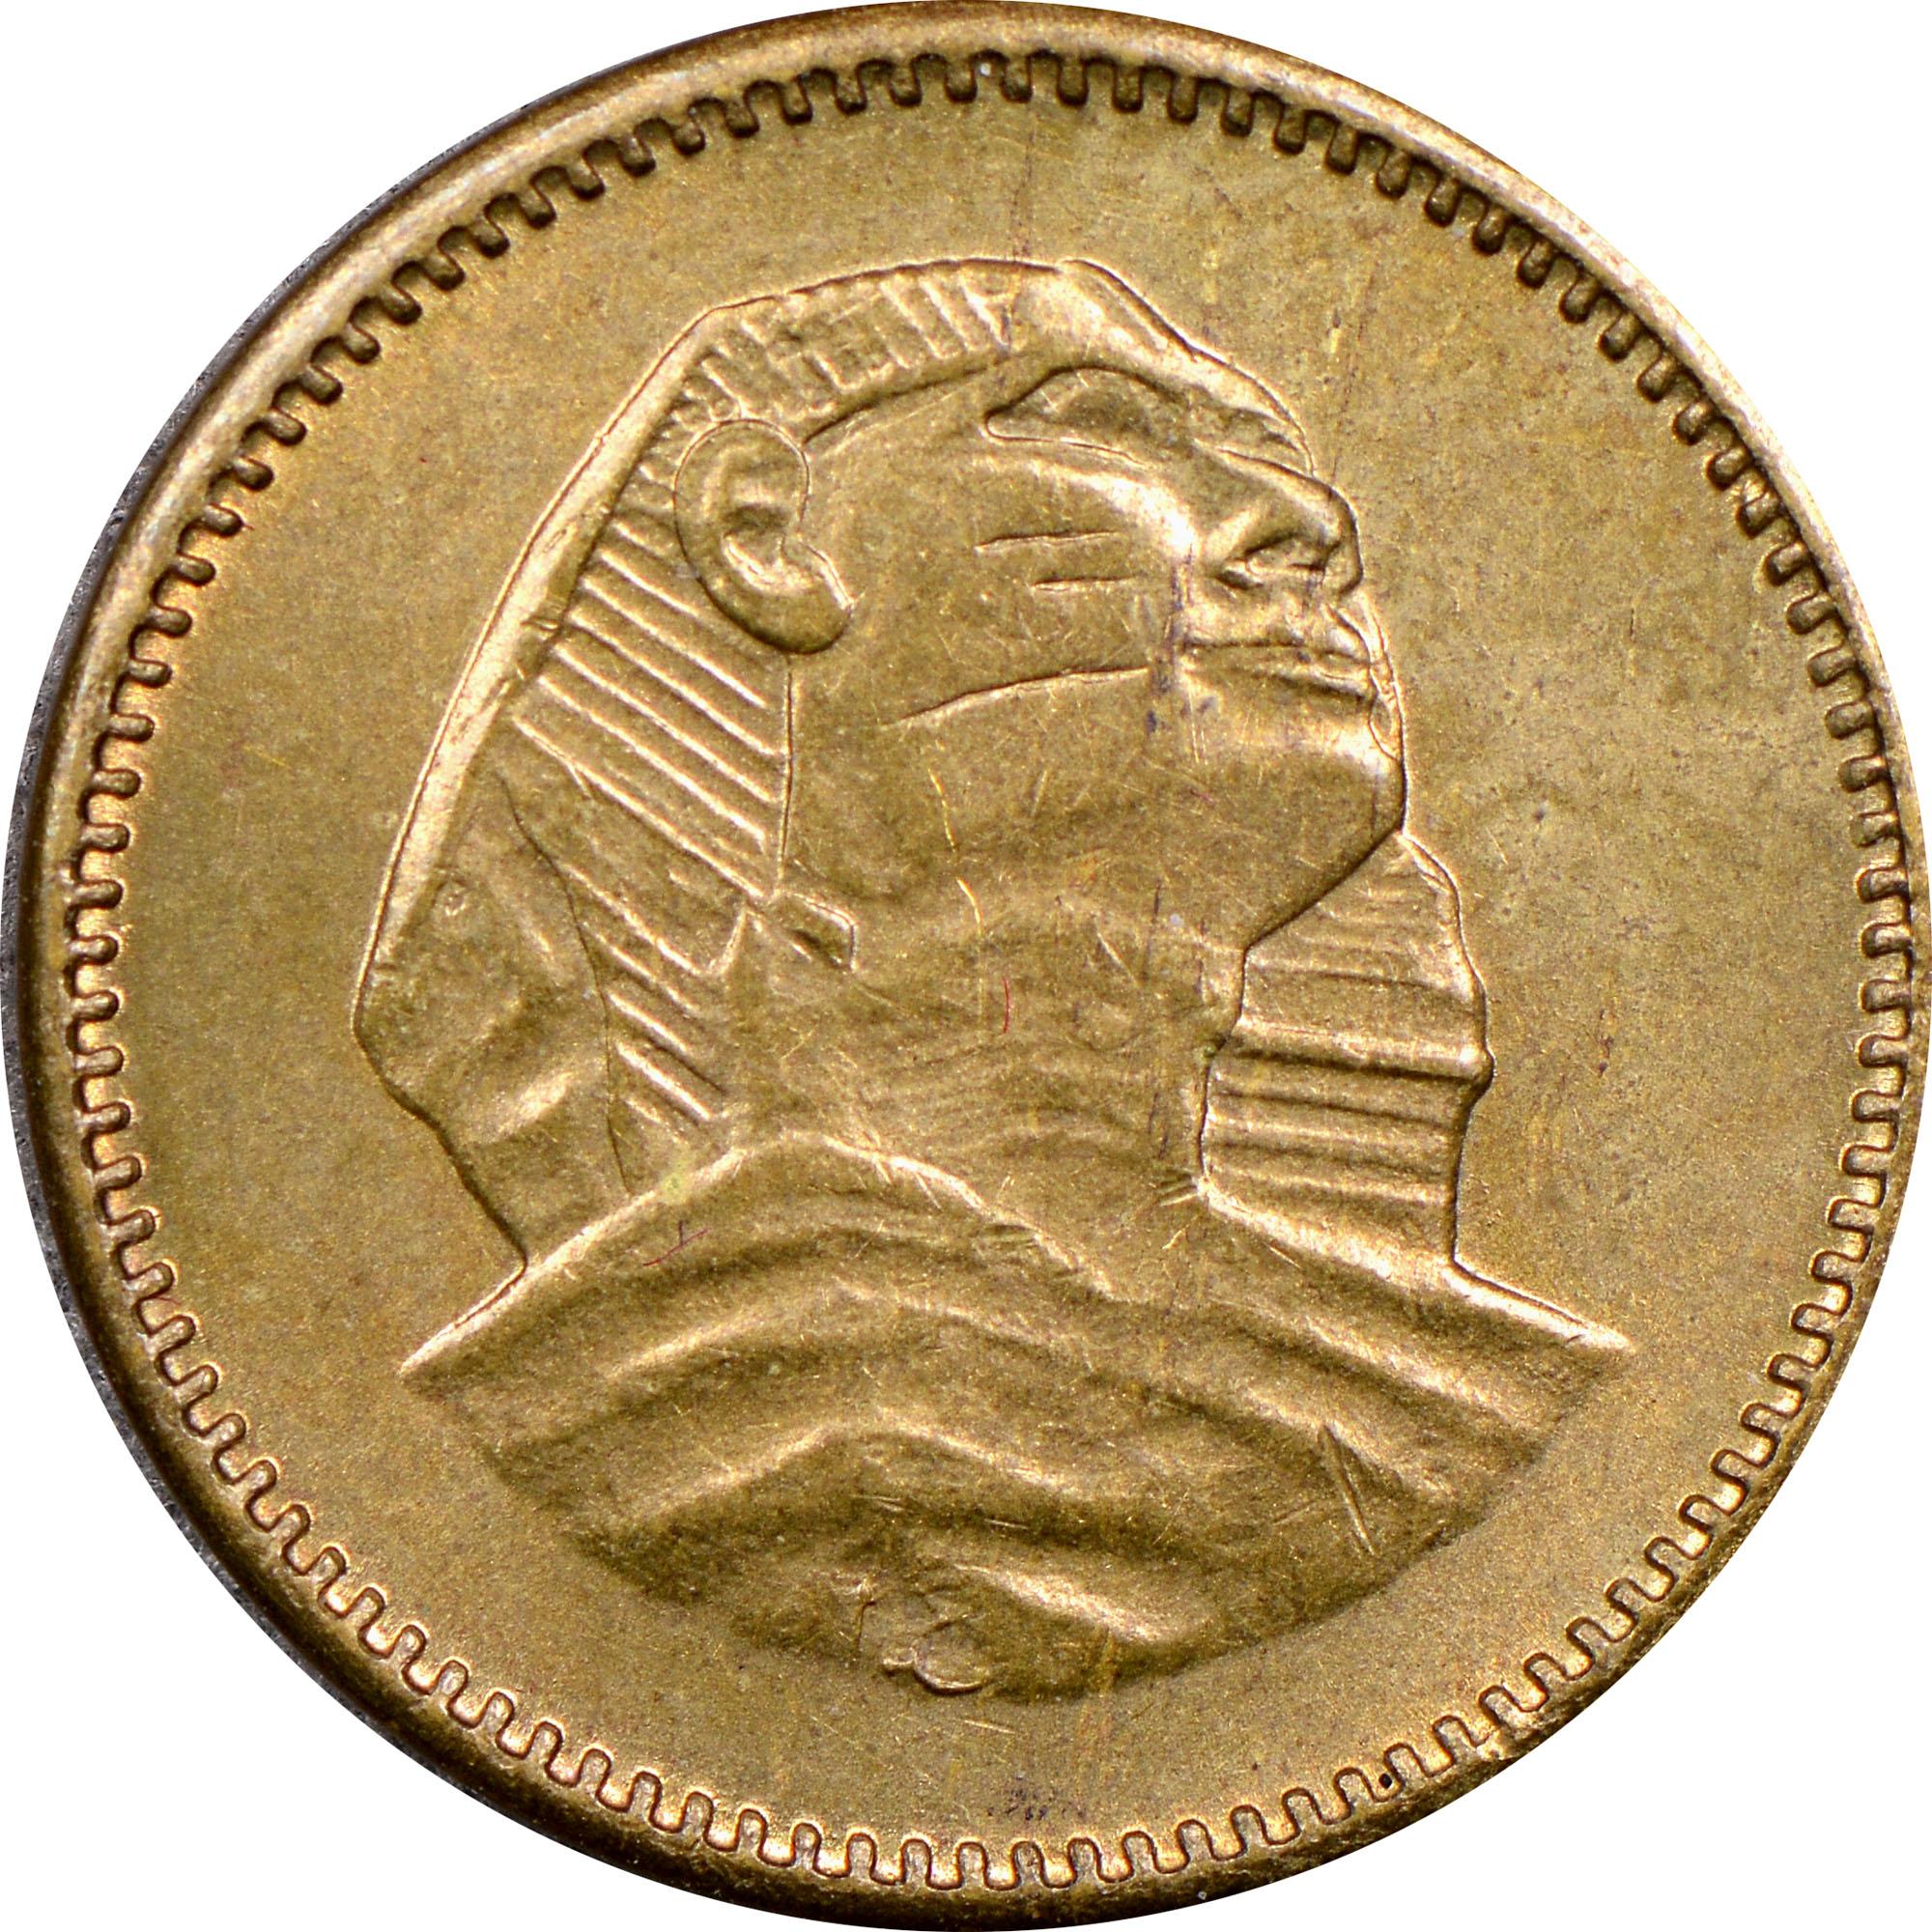 Egypt Millieme reverse